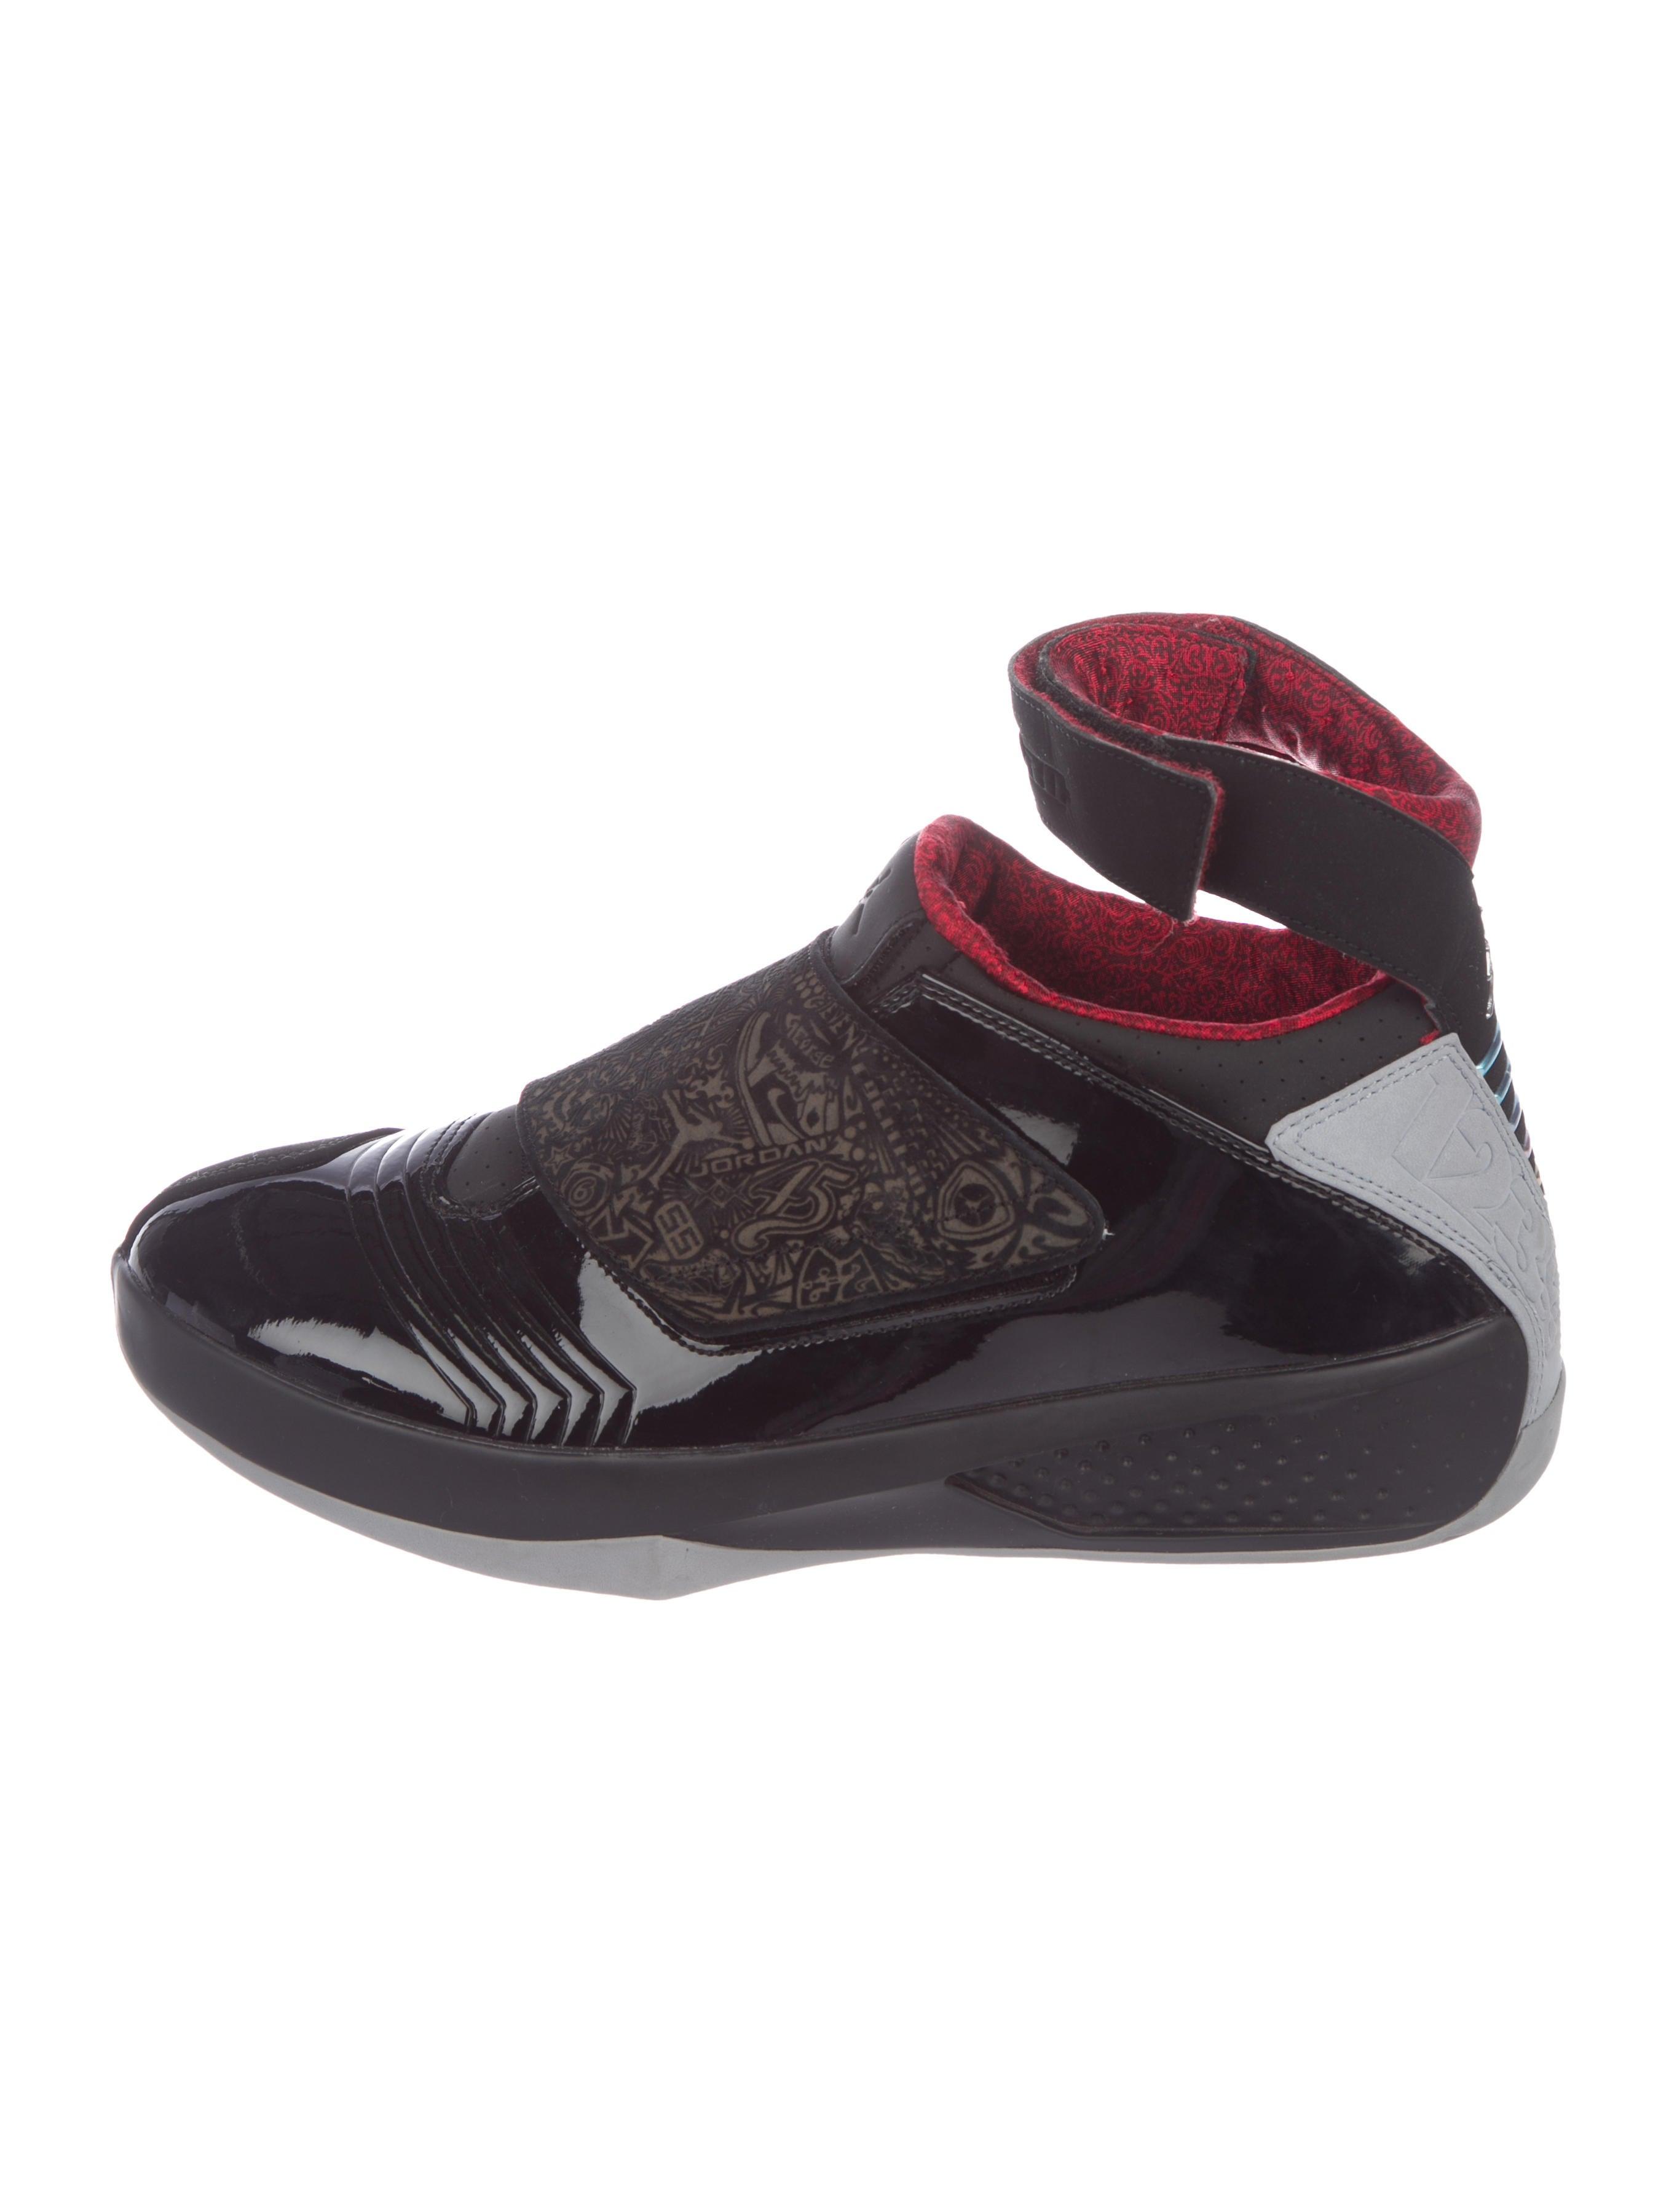 ... latest fashion a70ed 5c642 Men · Shoes Nike Air Jordan 20 Stealth  Sneakers. 19102848de